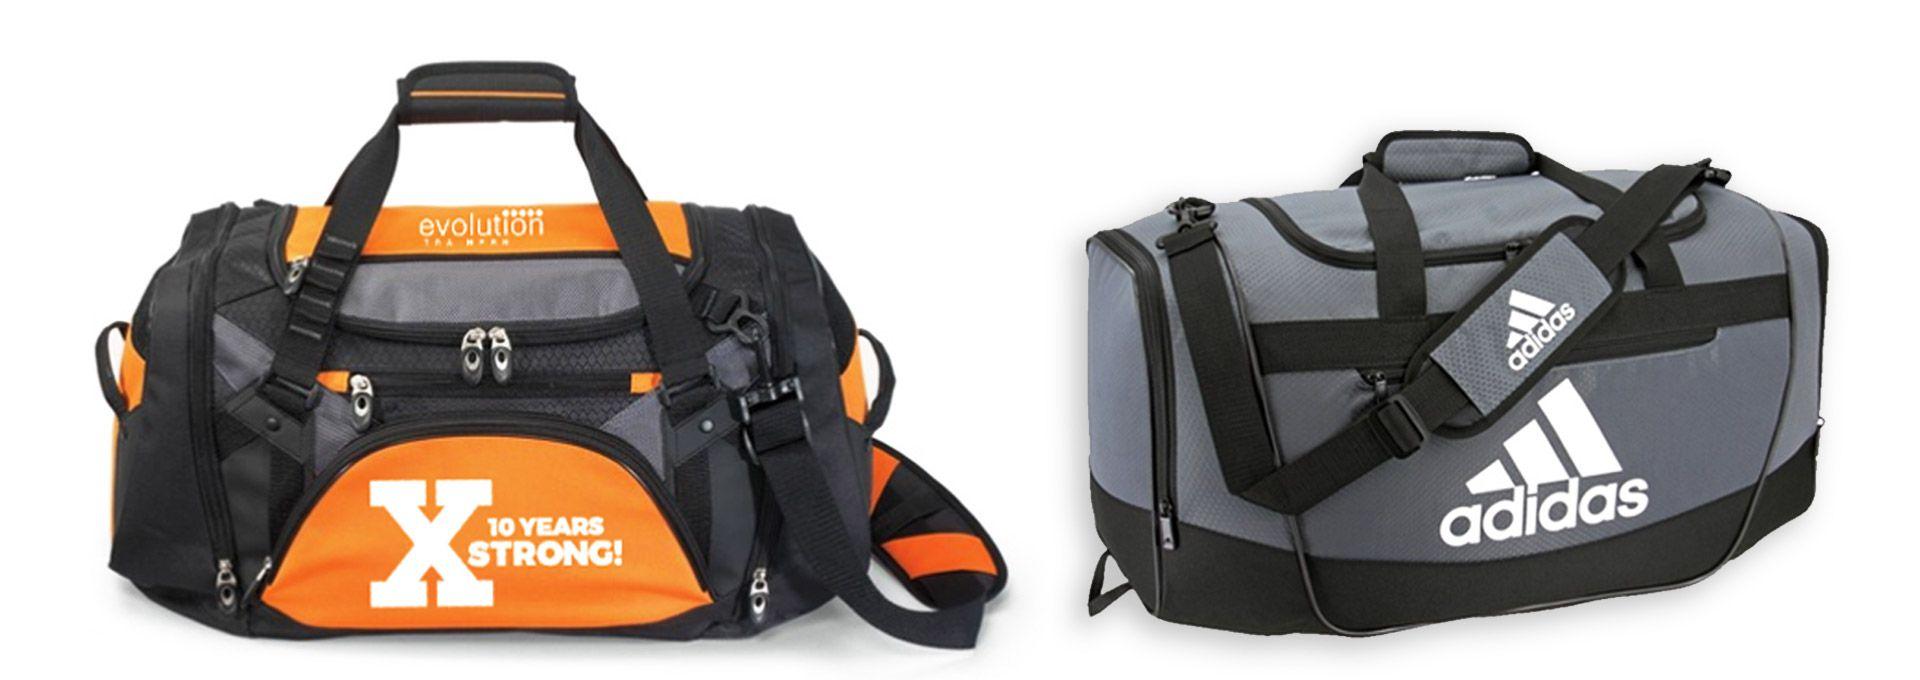 Custom Printed Branded Promotional Duffel Bags Supplier Seattle